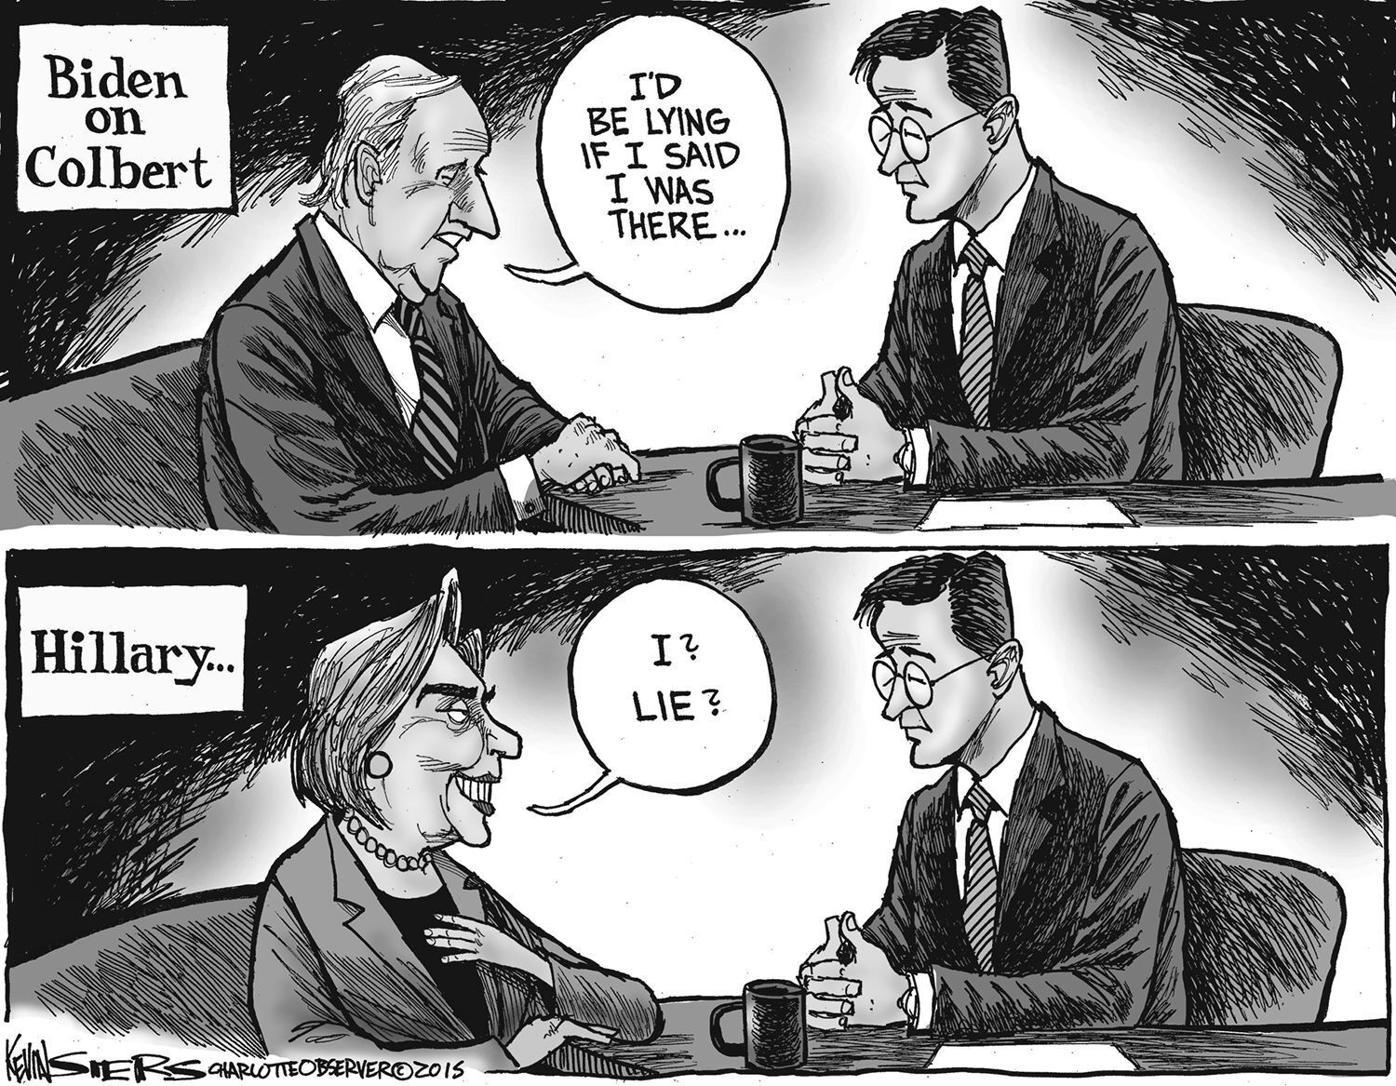 Biden and Hillary on Colbert (2015)